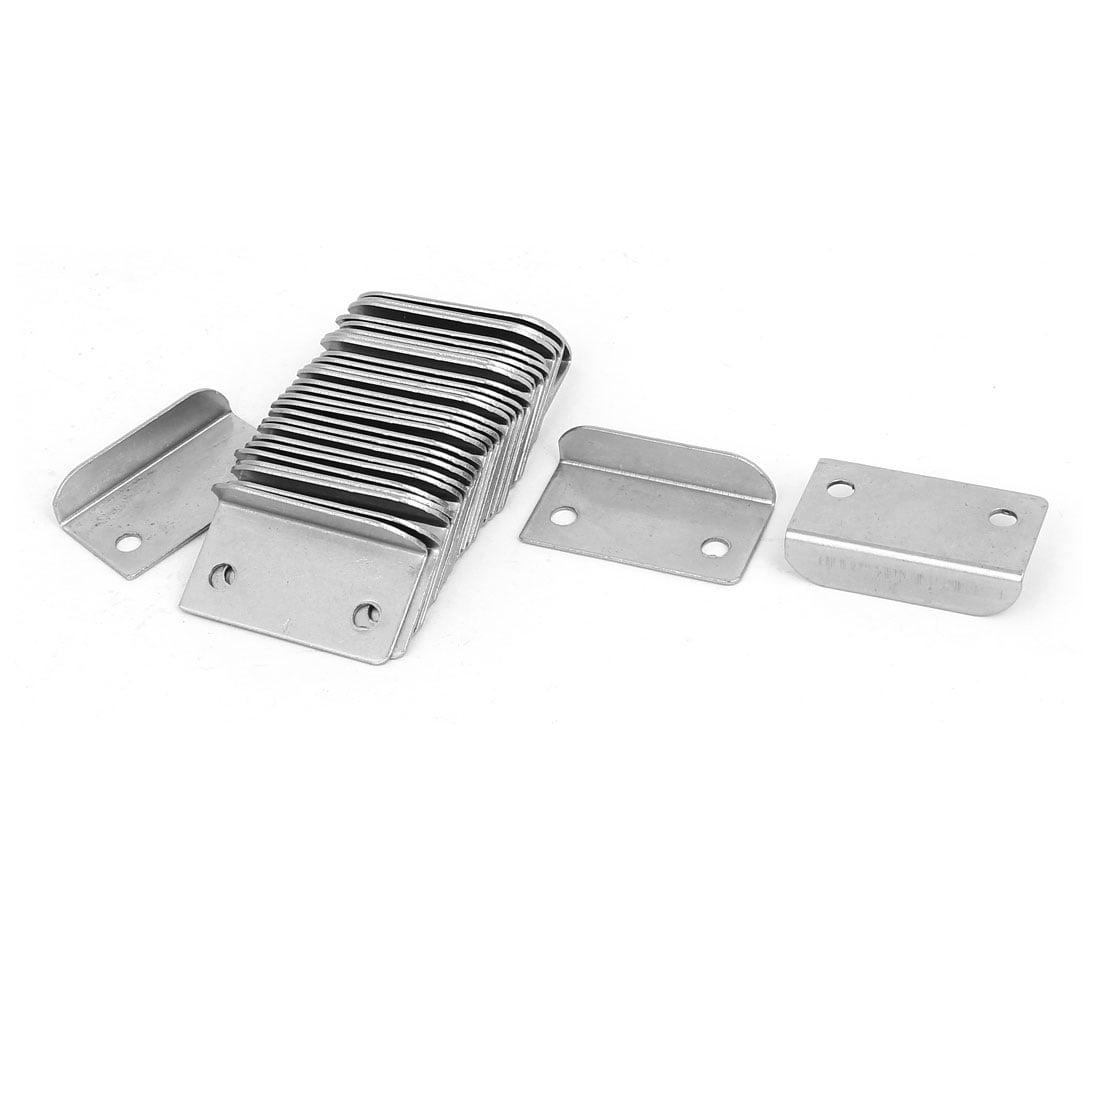 Home Office Cabinet Drawer Metal Lock Strike Plates 39mm Length 30PCS - image 3 de 3